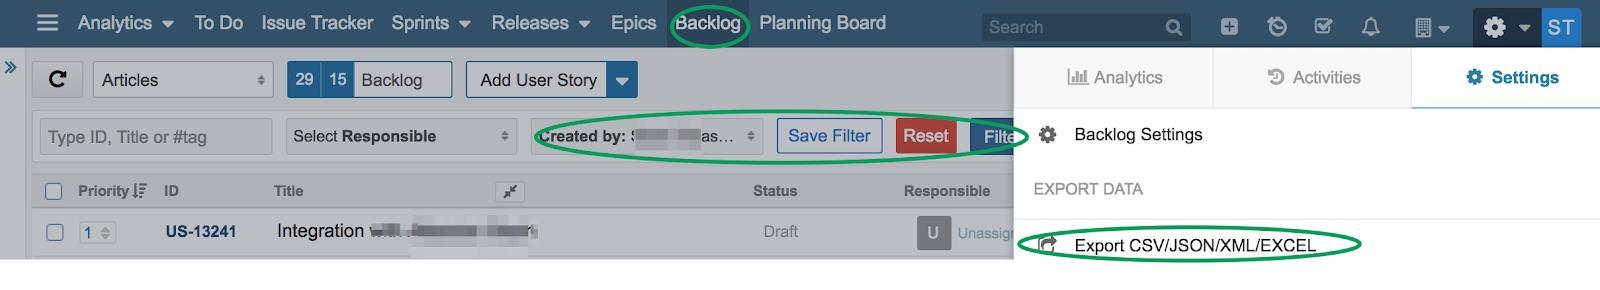 Backlog-Filters-Export